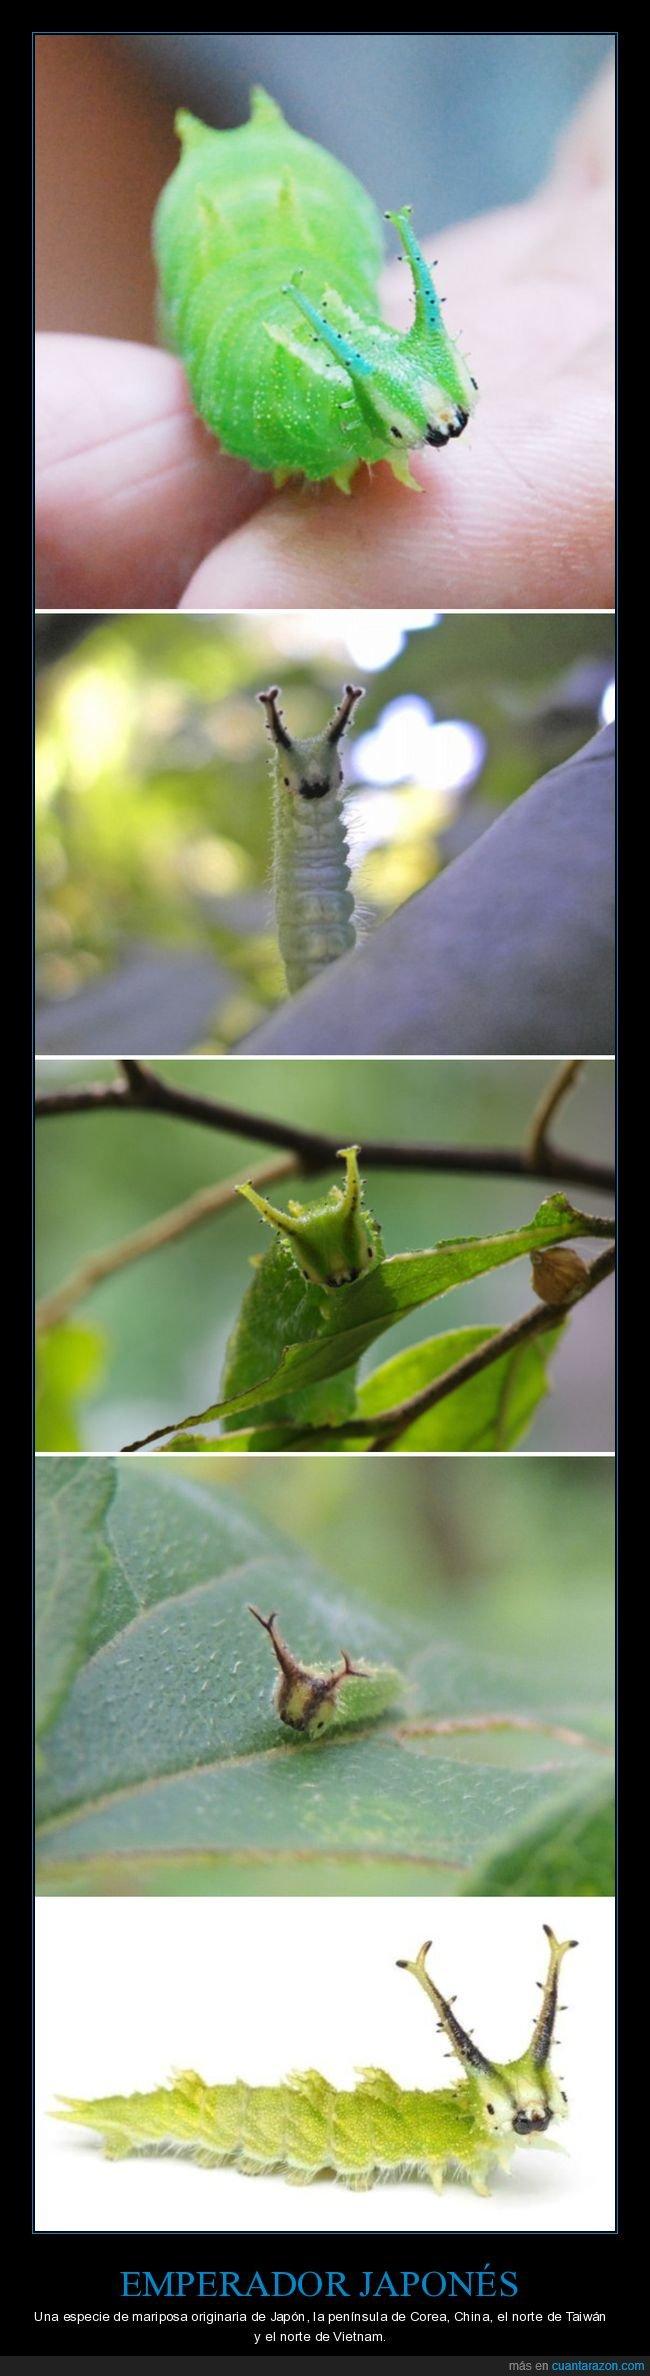 curiosidades,emperador japonés,mariposa,oruga